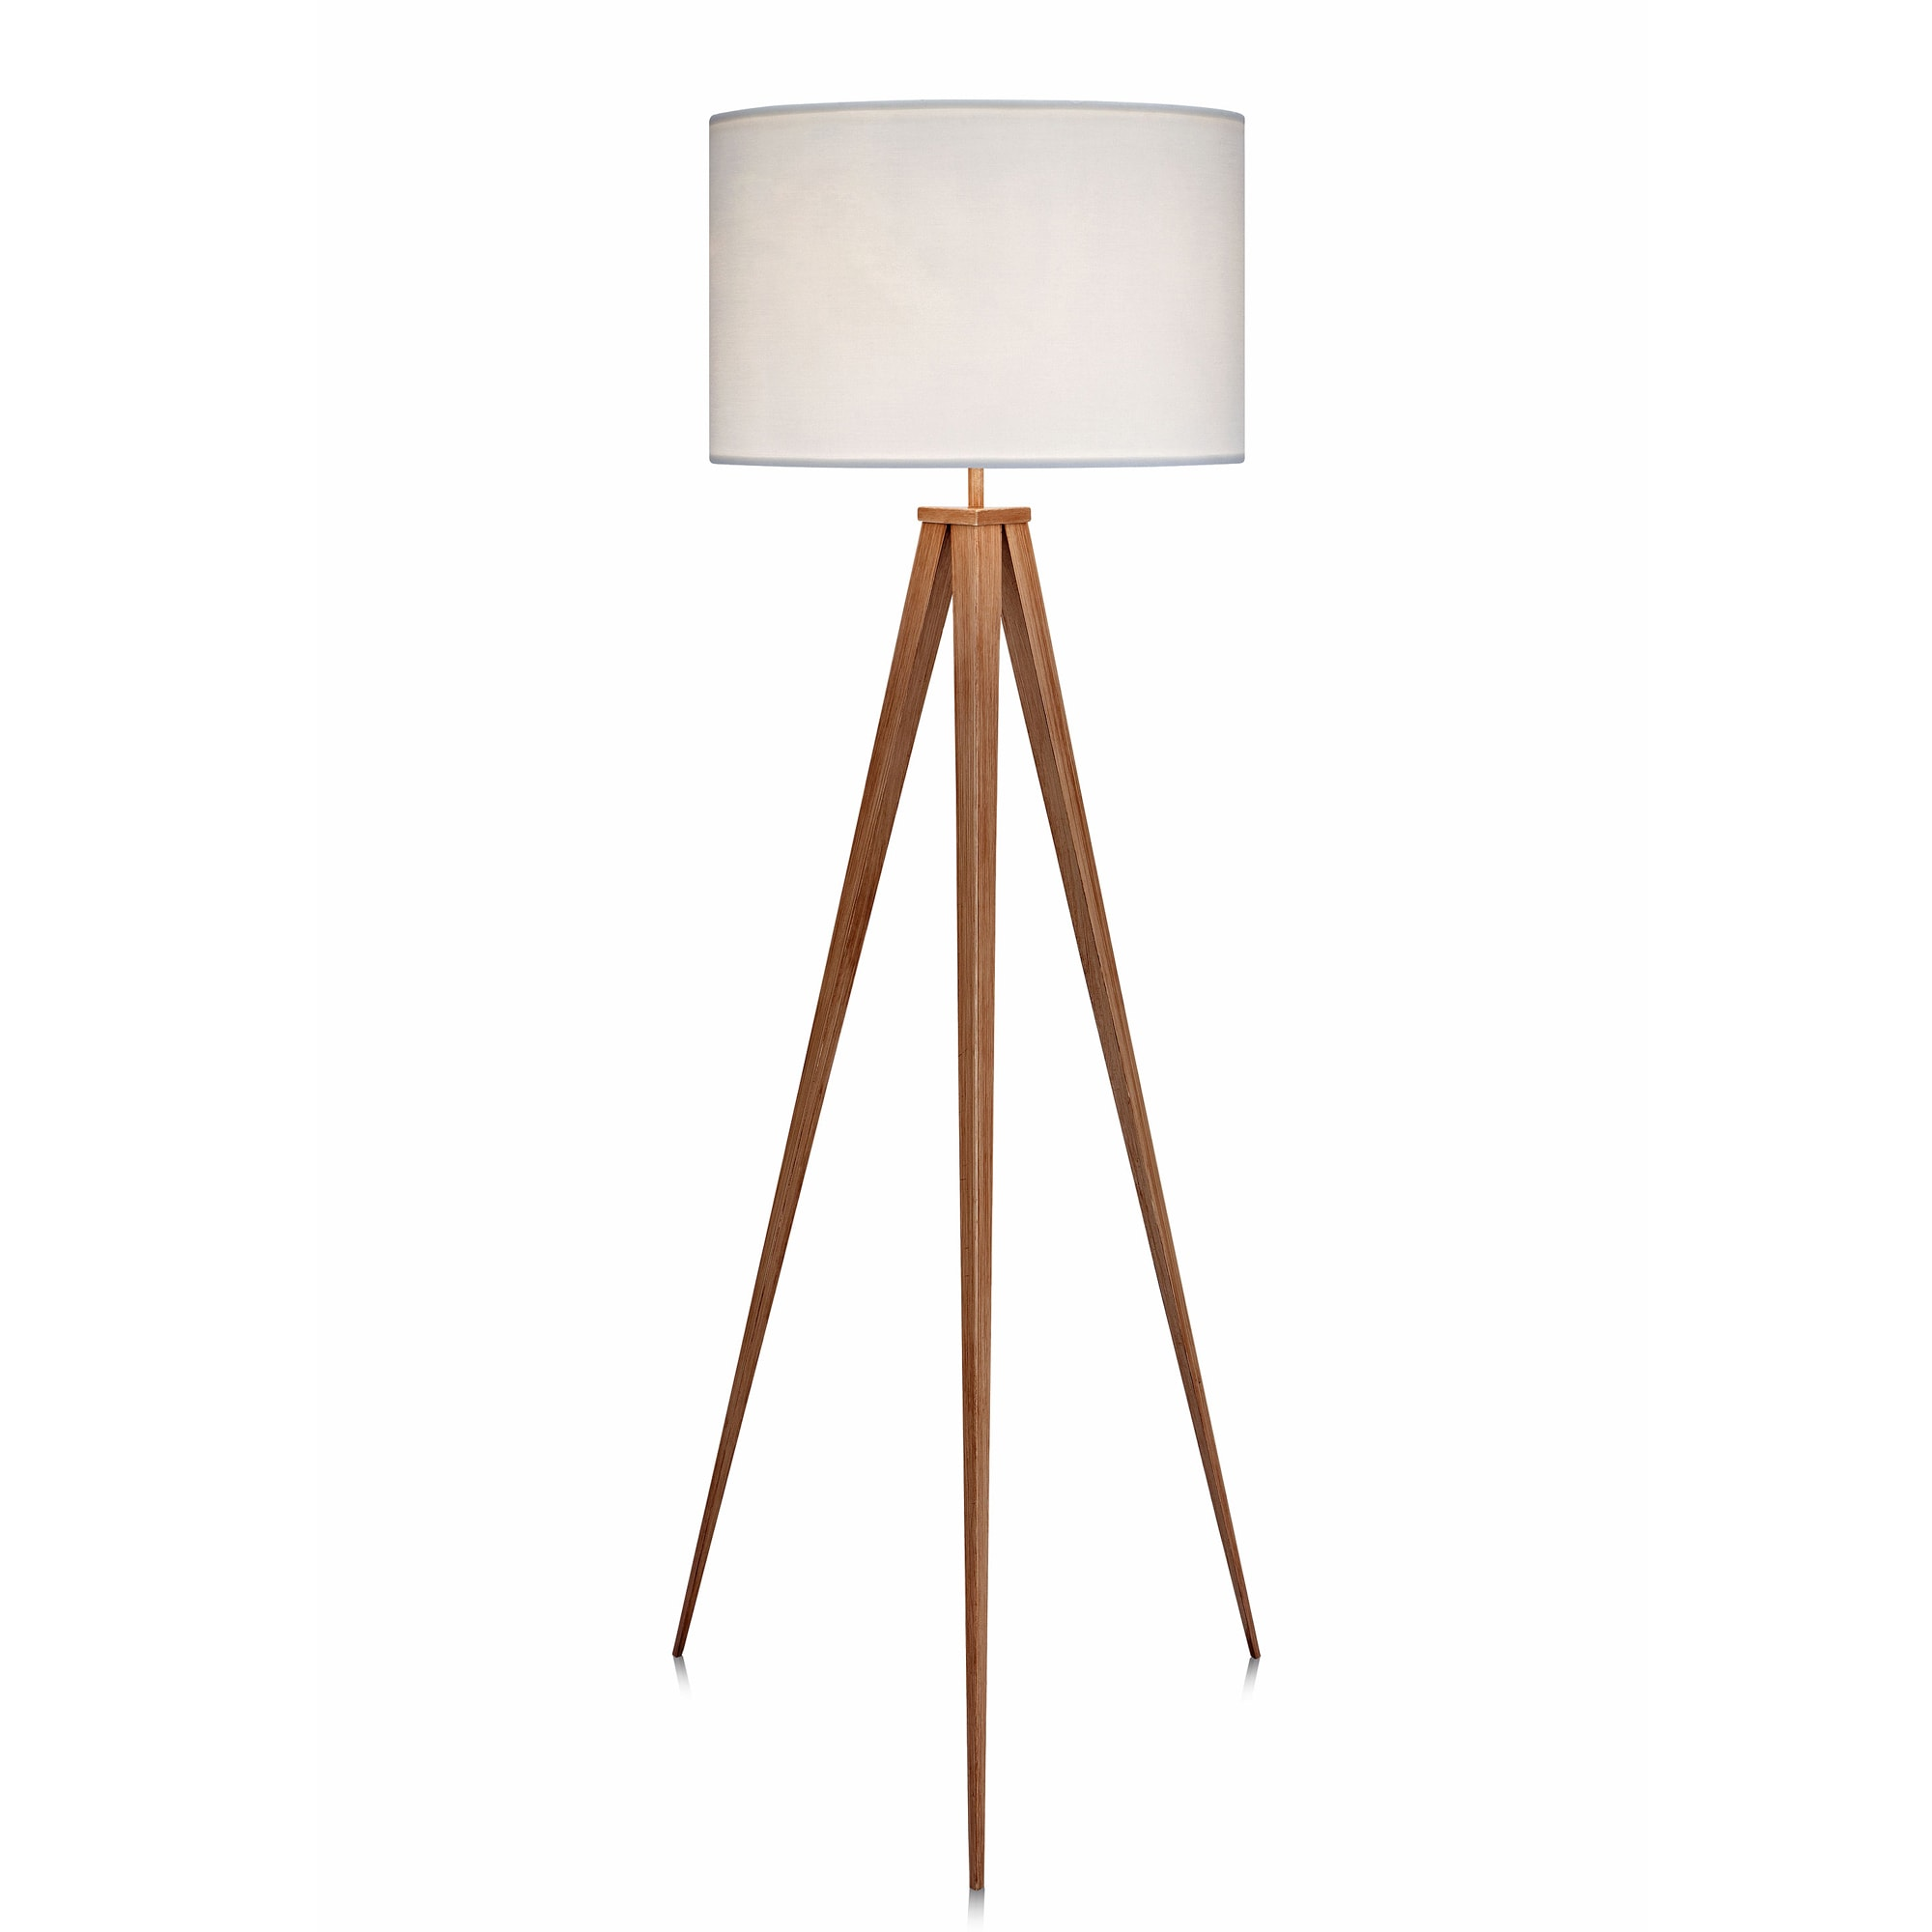 tripod vintage lamp wooden the lamps surveyor six kim wood fix floor